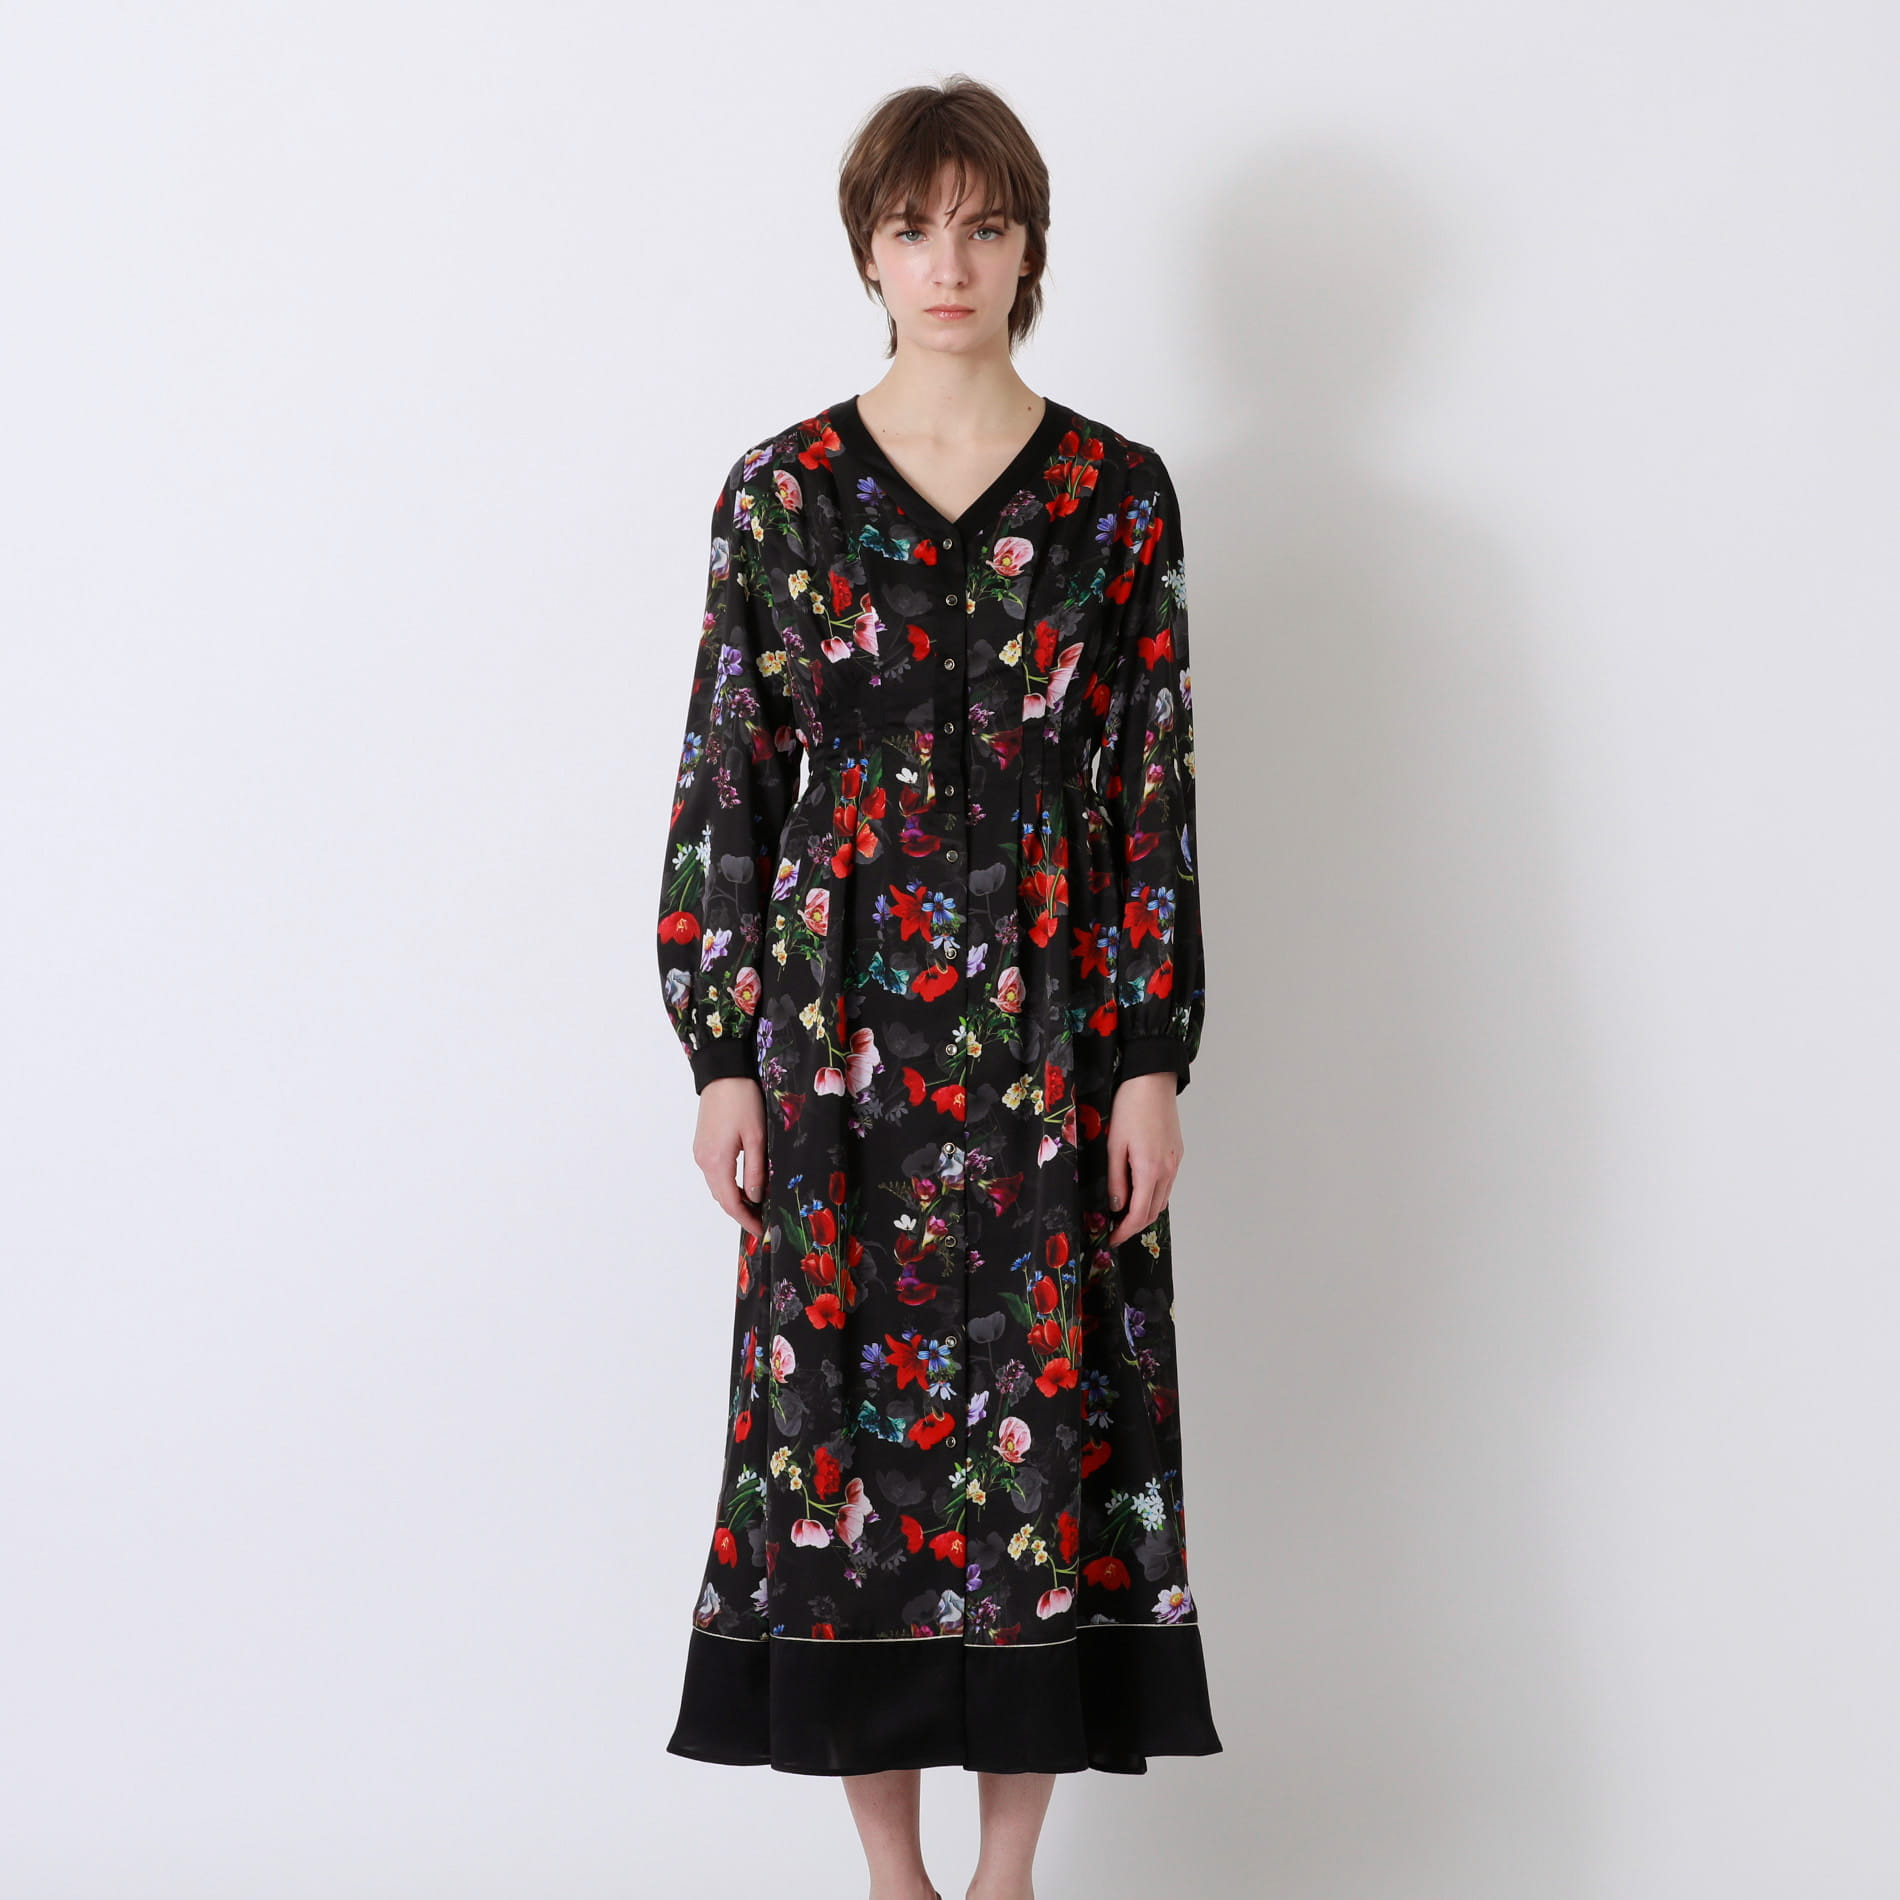 nowartt コンビ マキシ ドレス